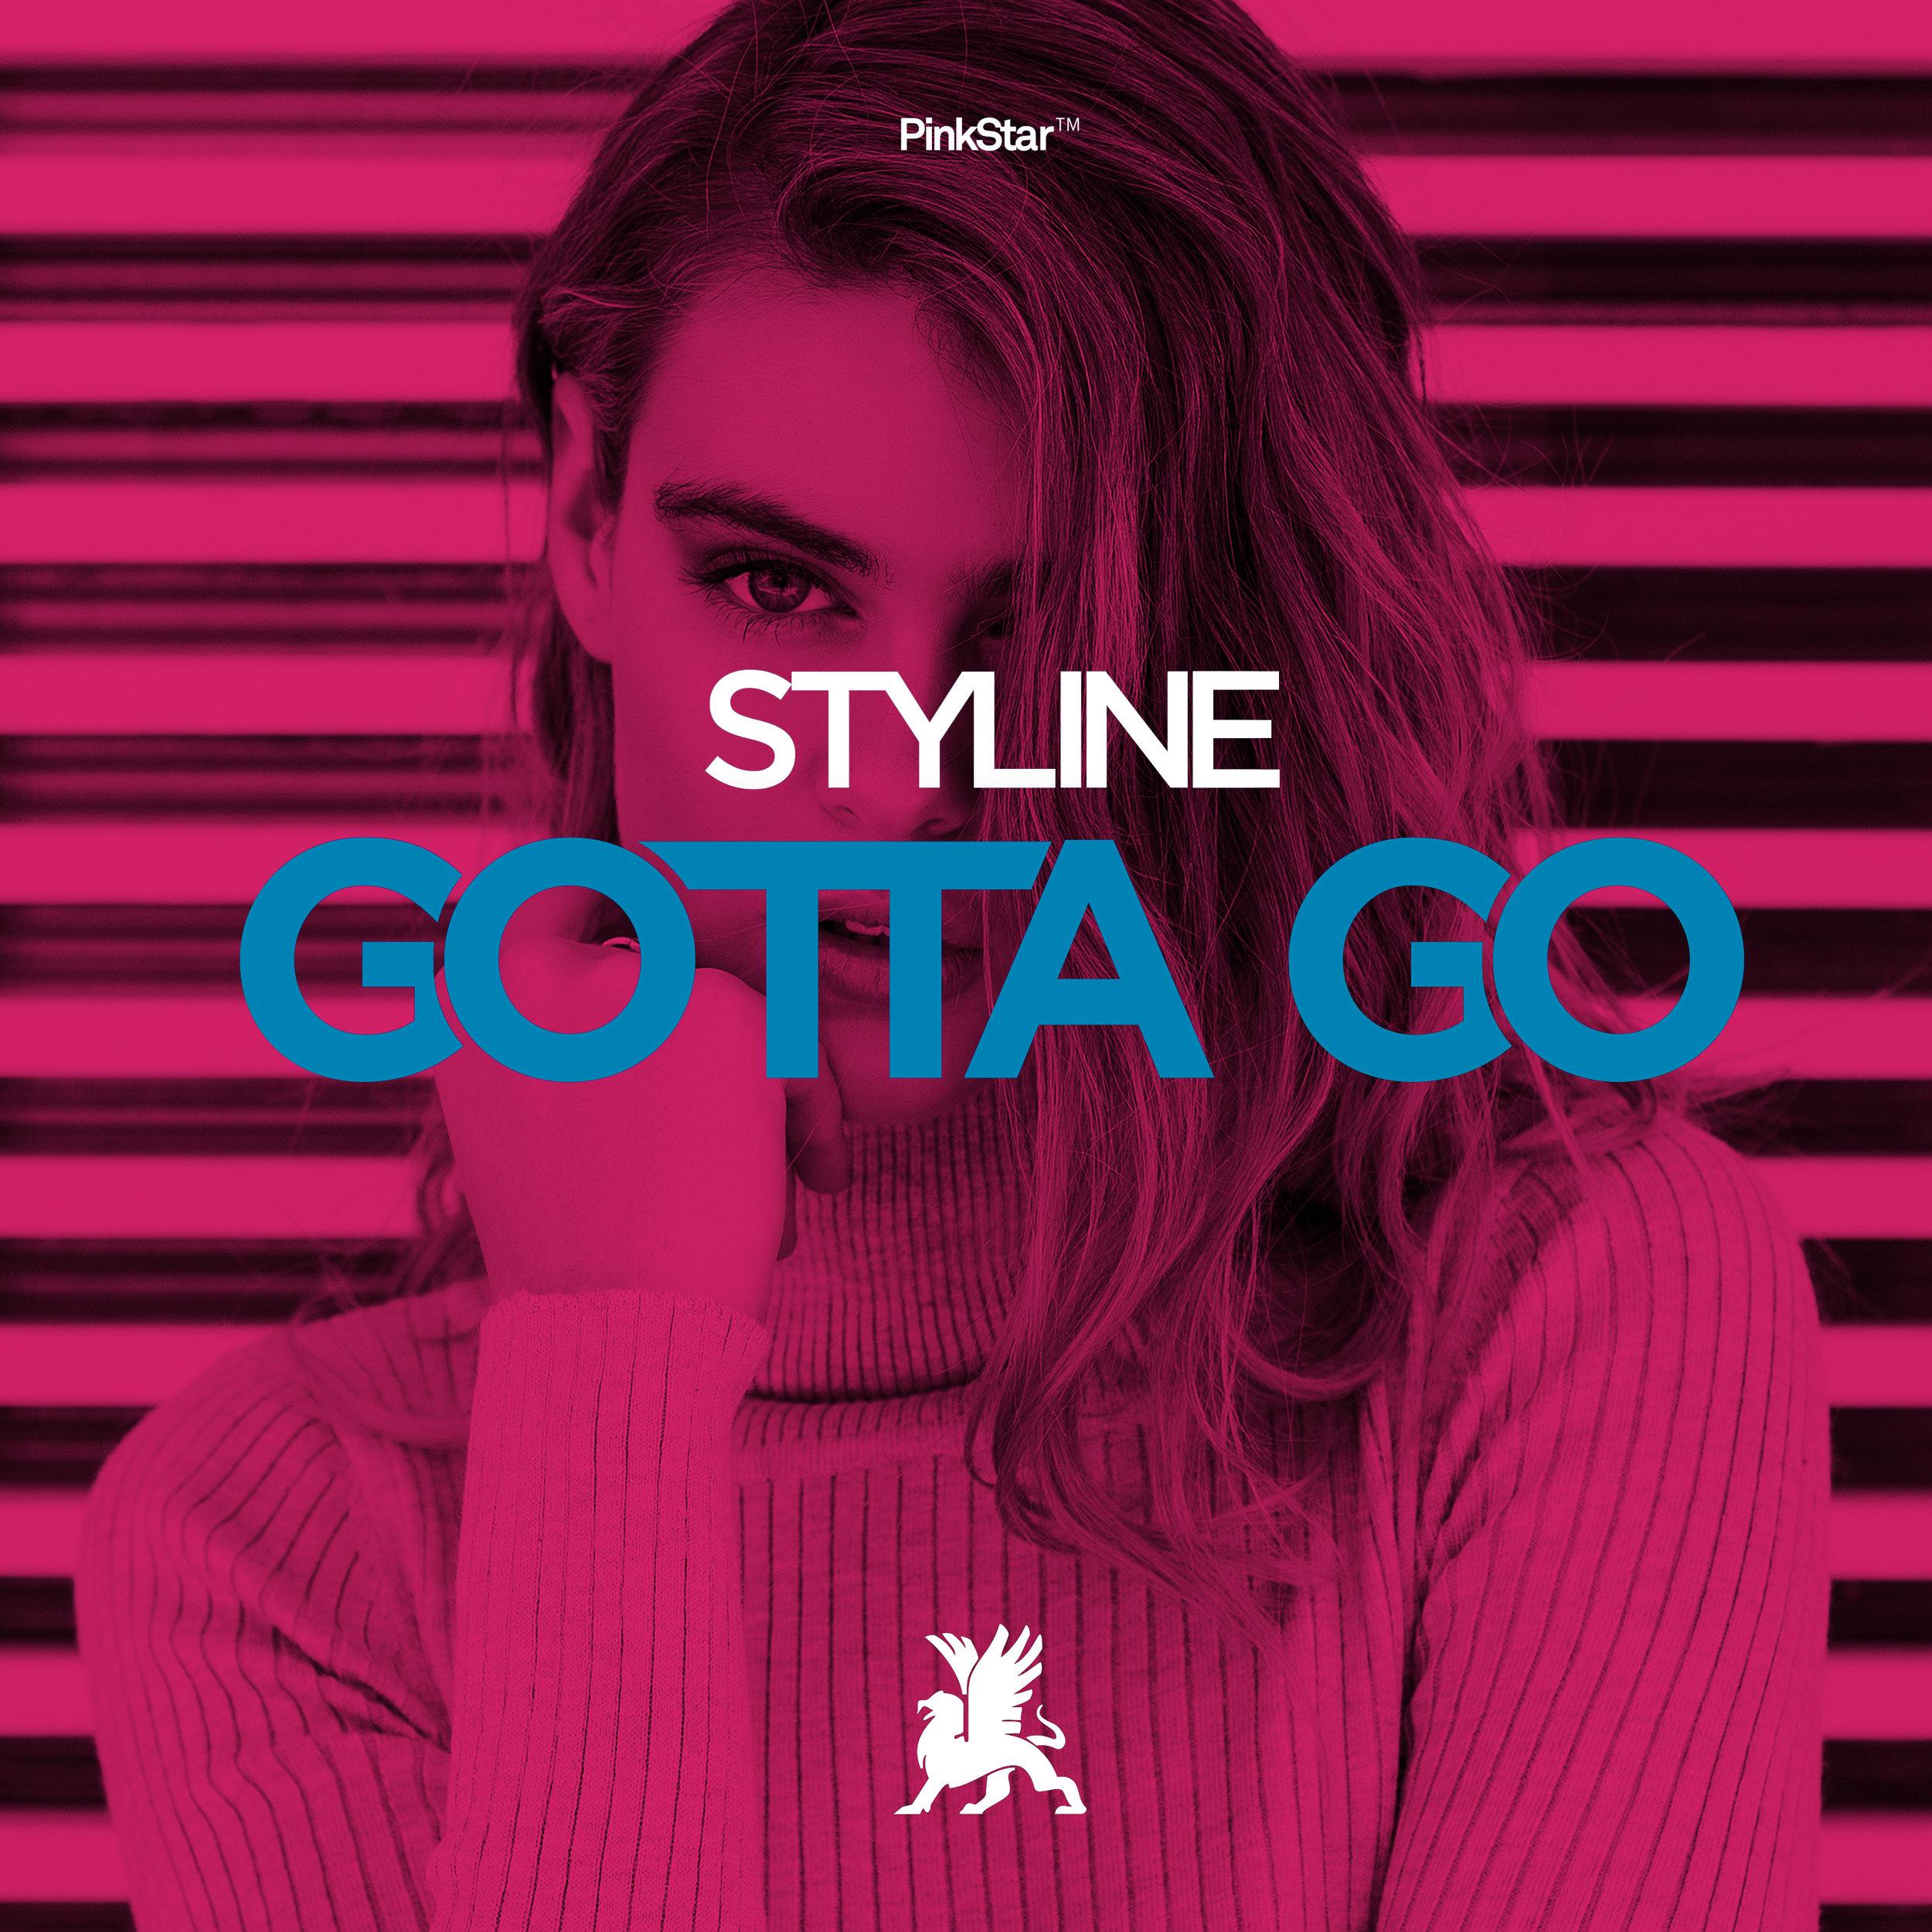 Styline - Gotta Go.jpg